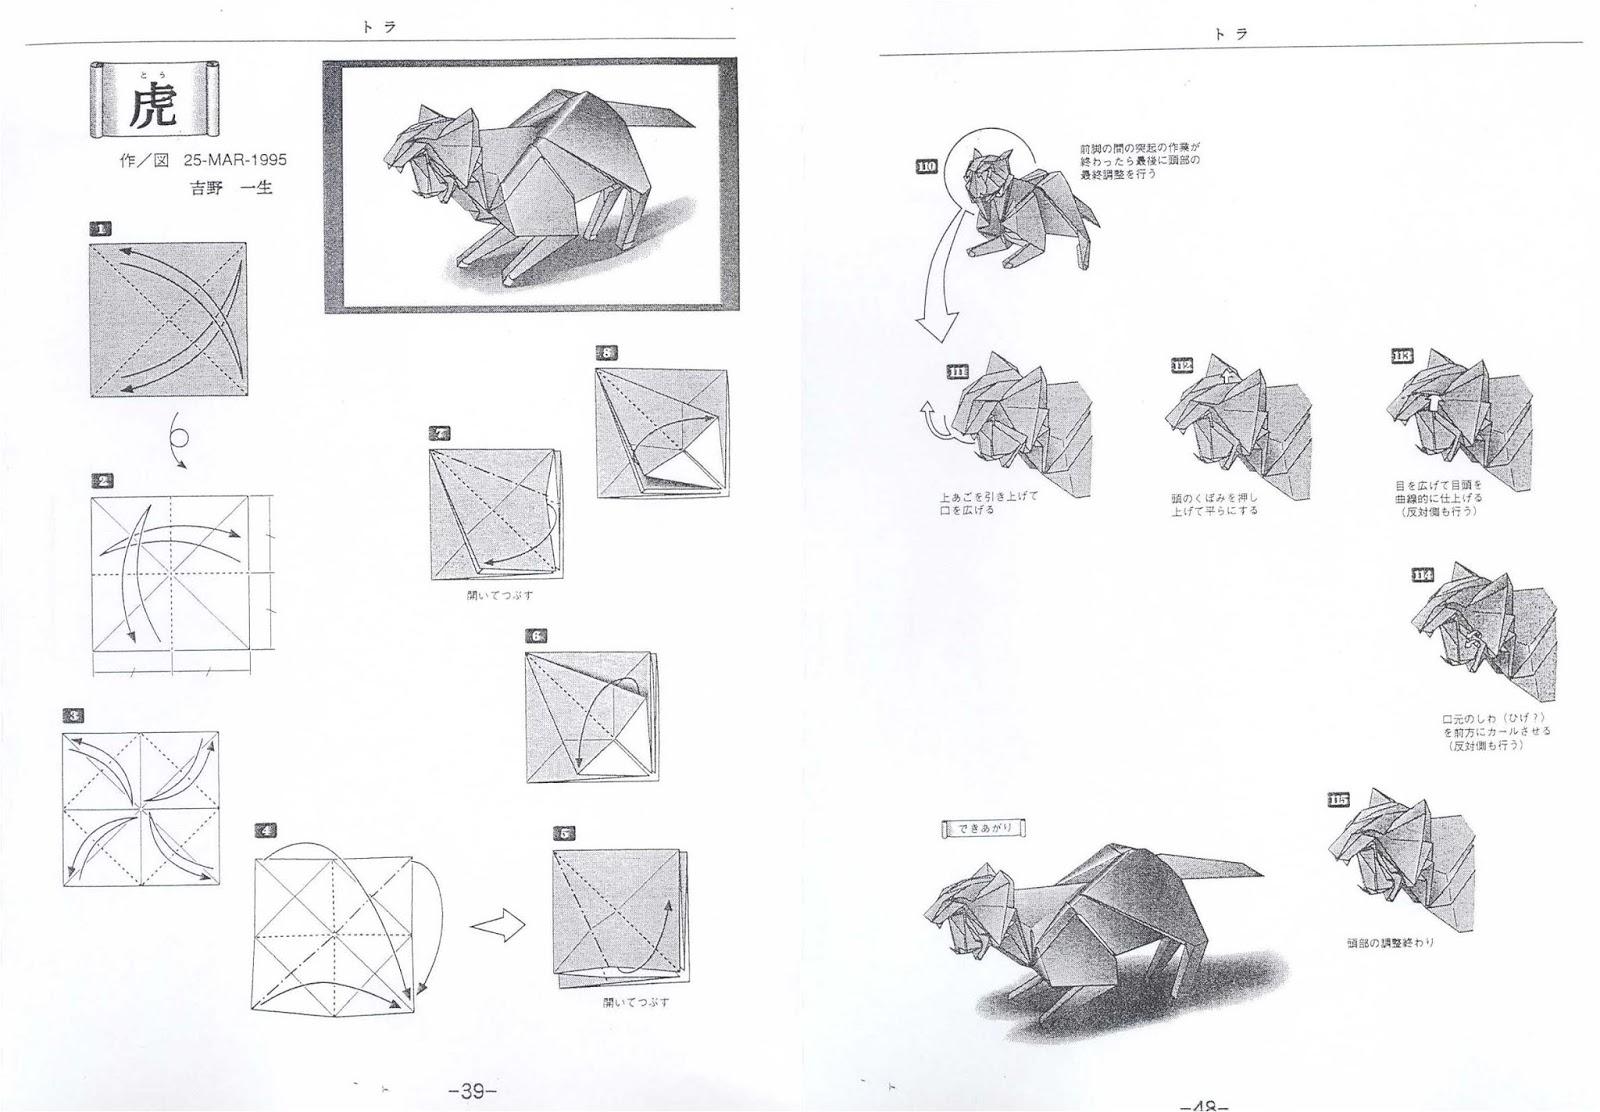 [eBook] Tanteidan Convention Book 01